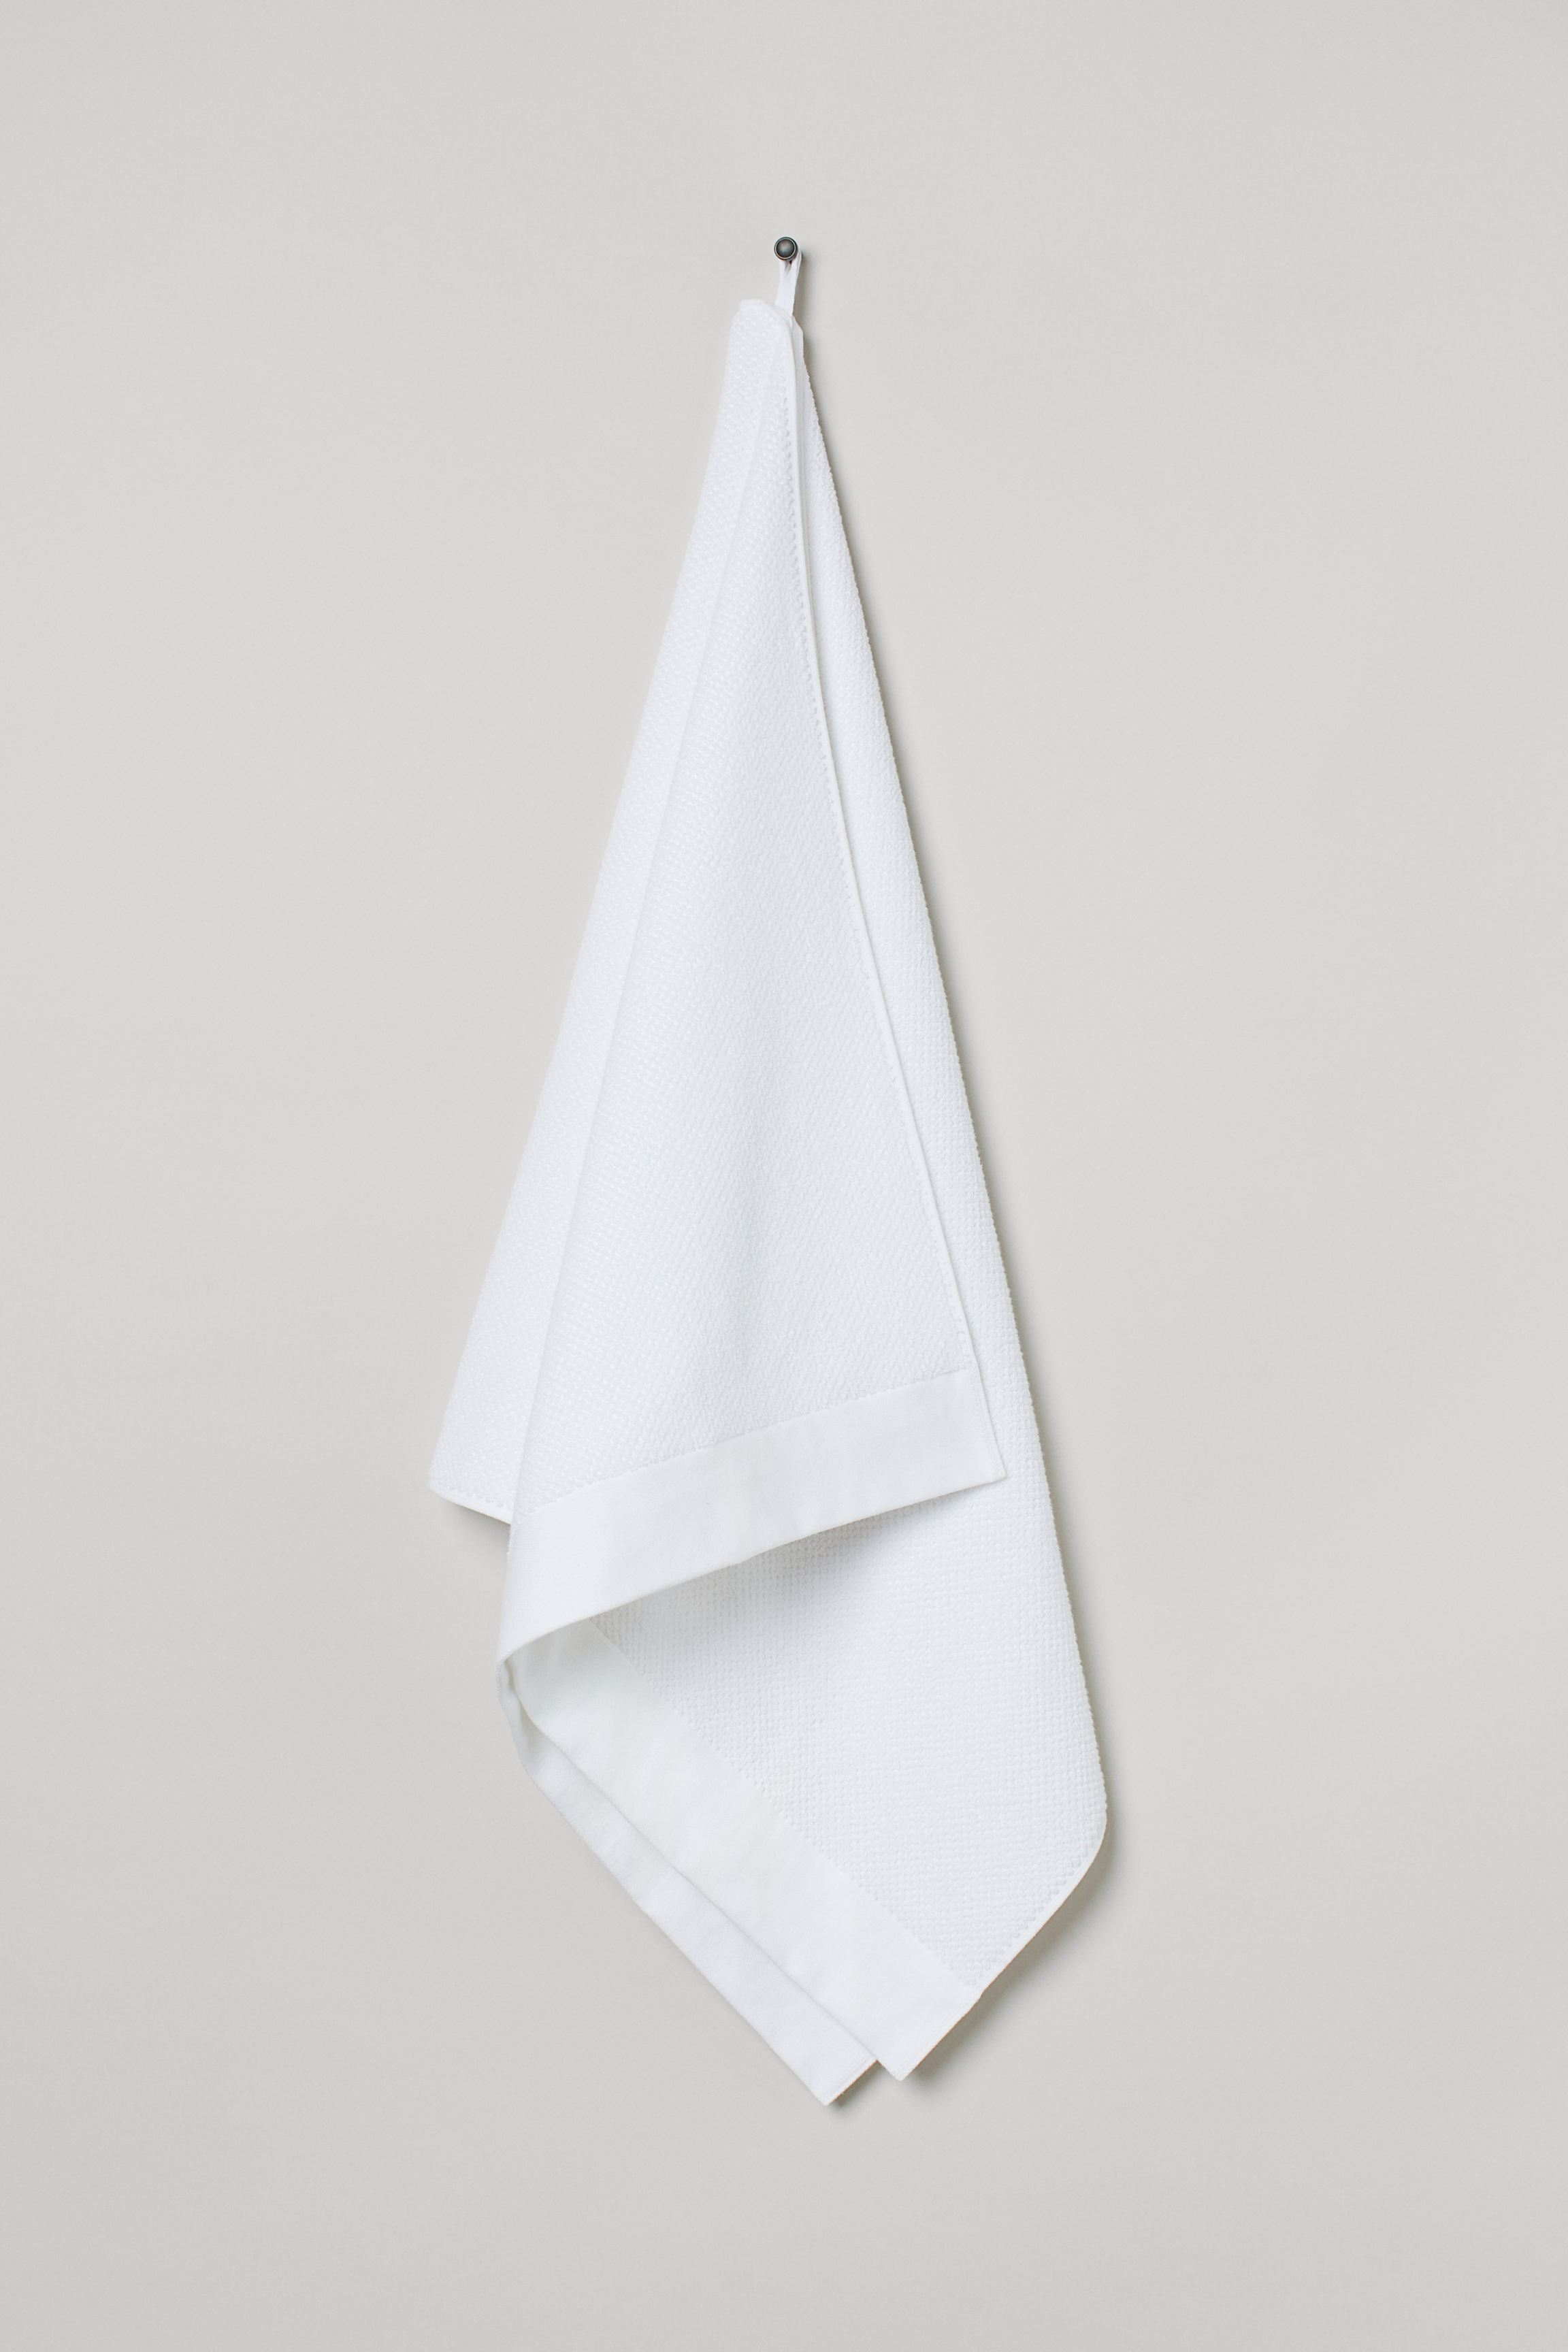 Cotton Terry Bath Towel